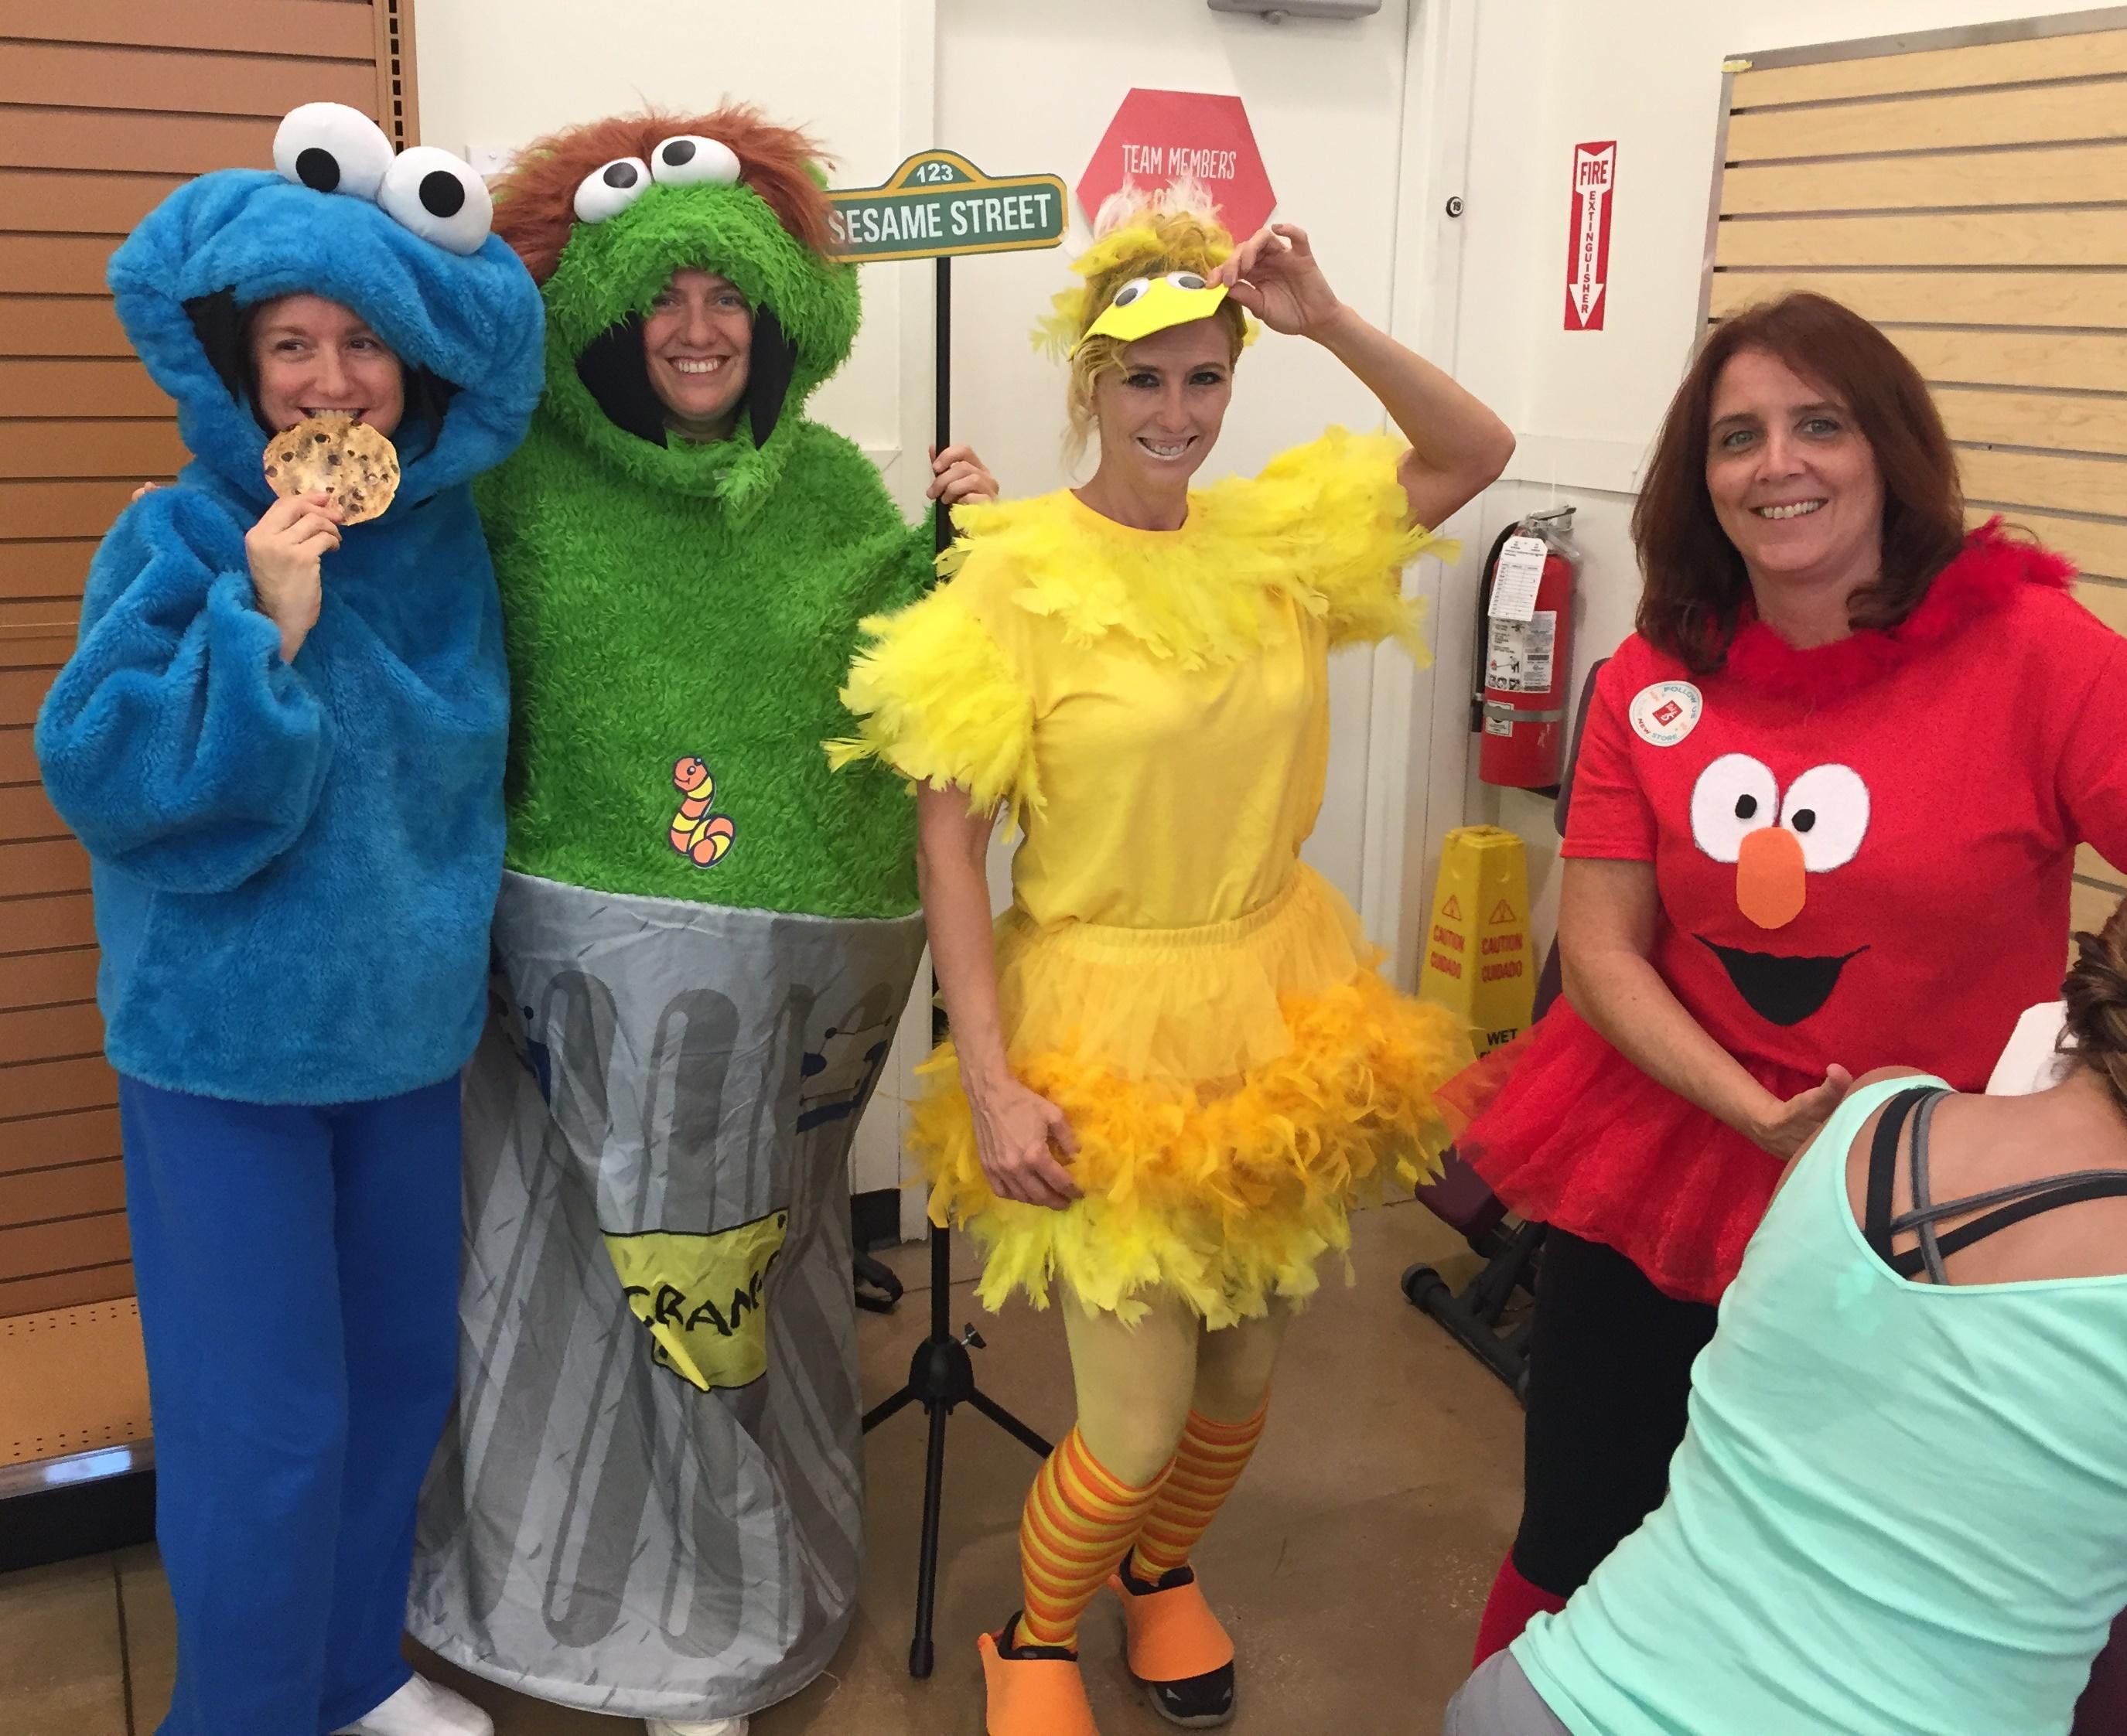 Sesame Street Crowd